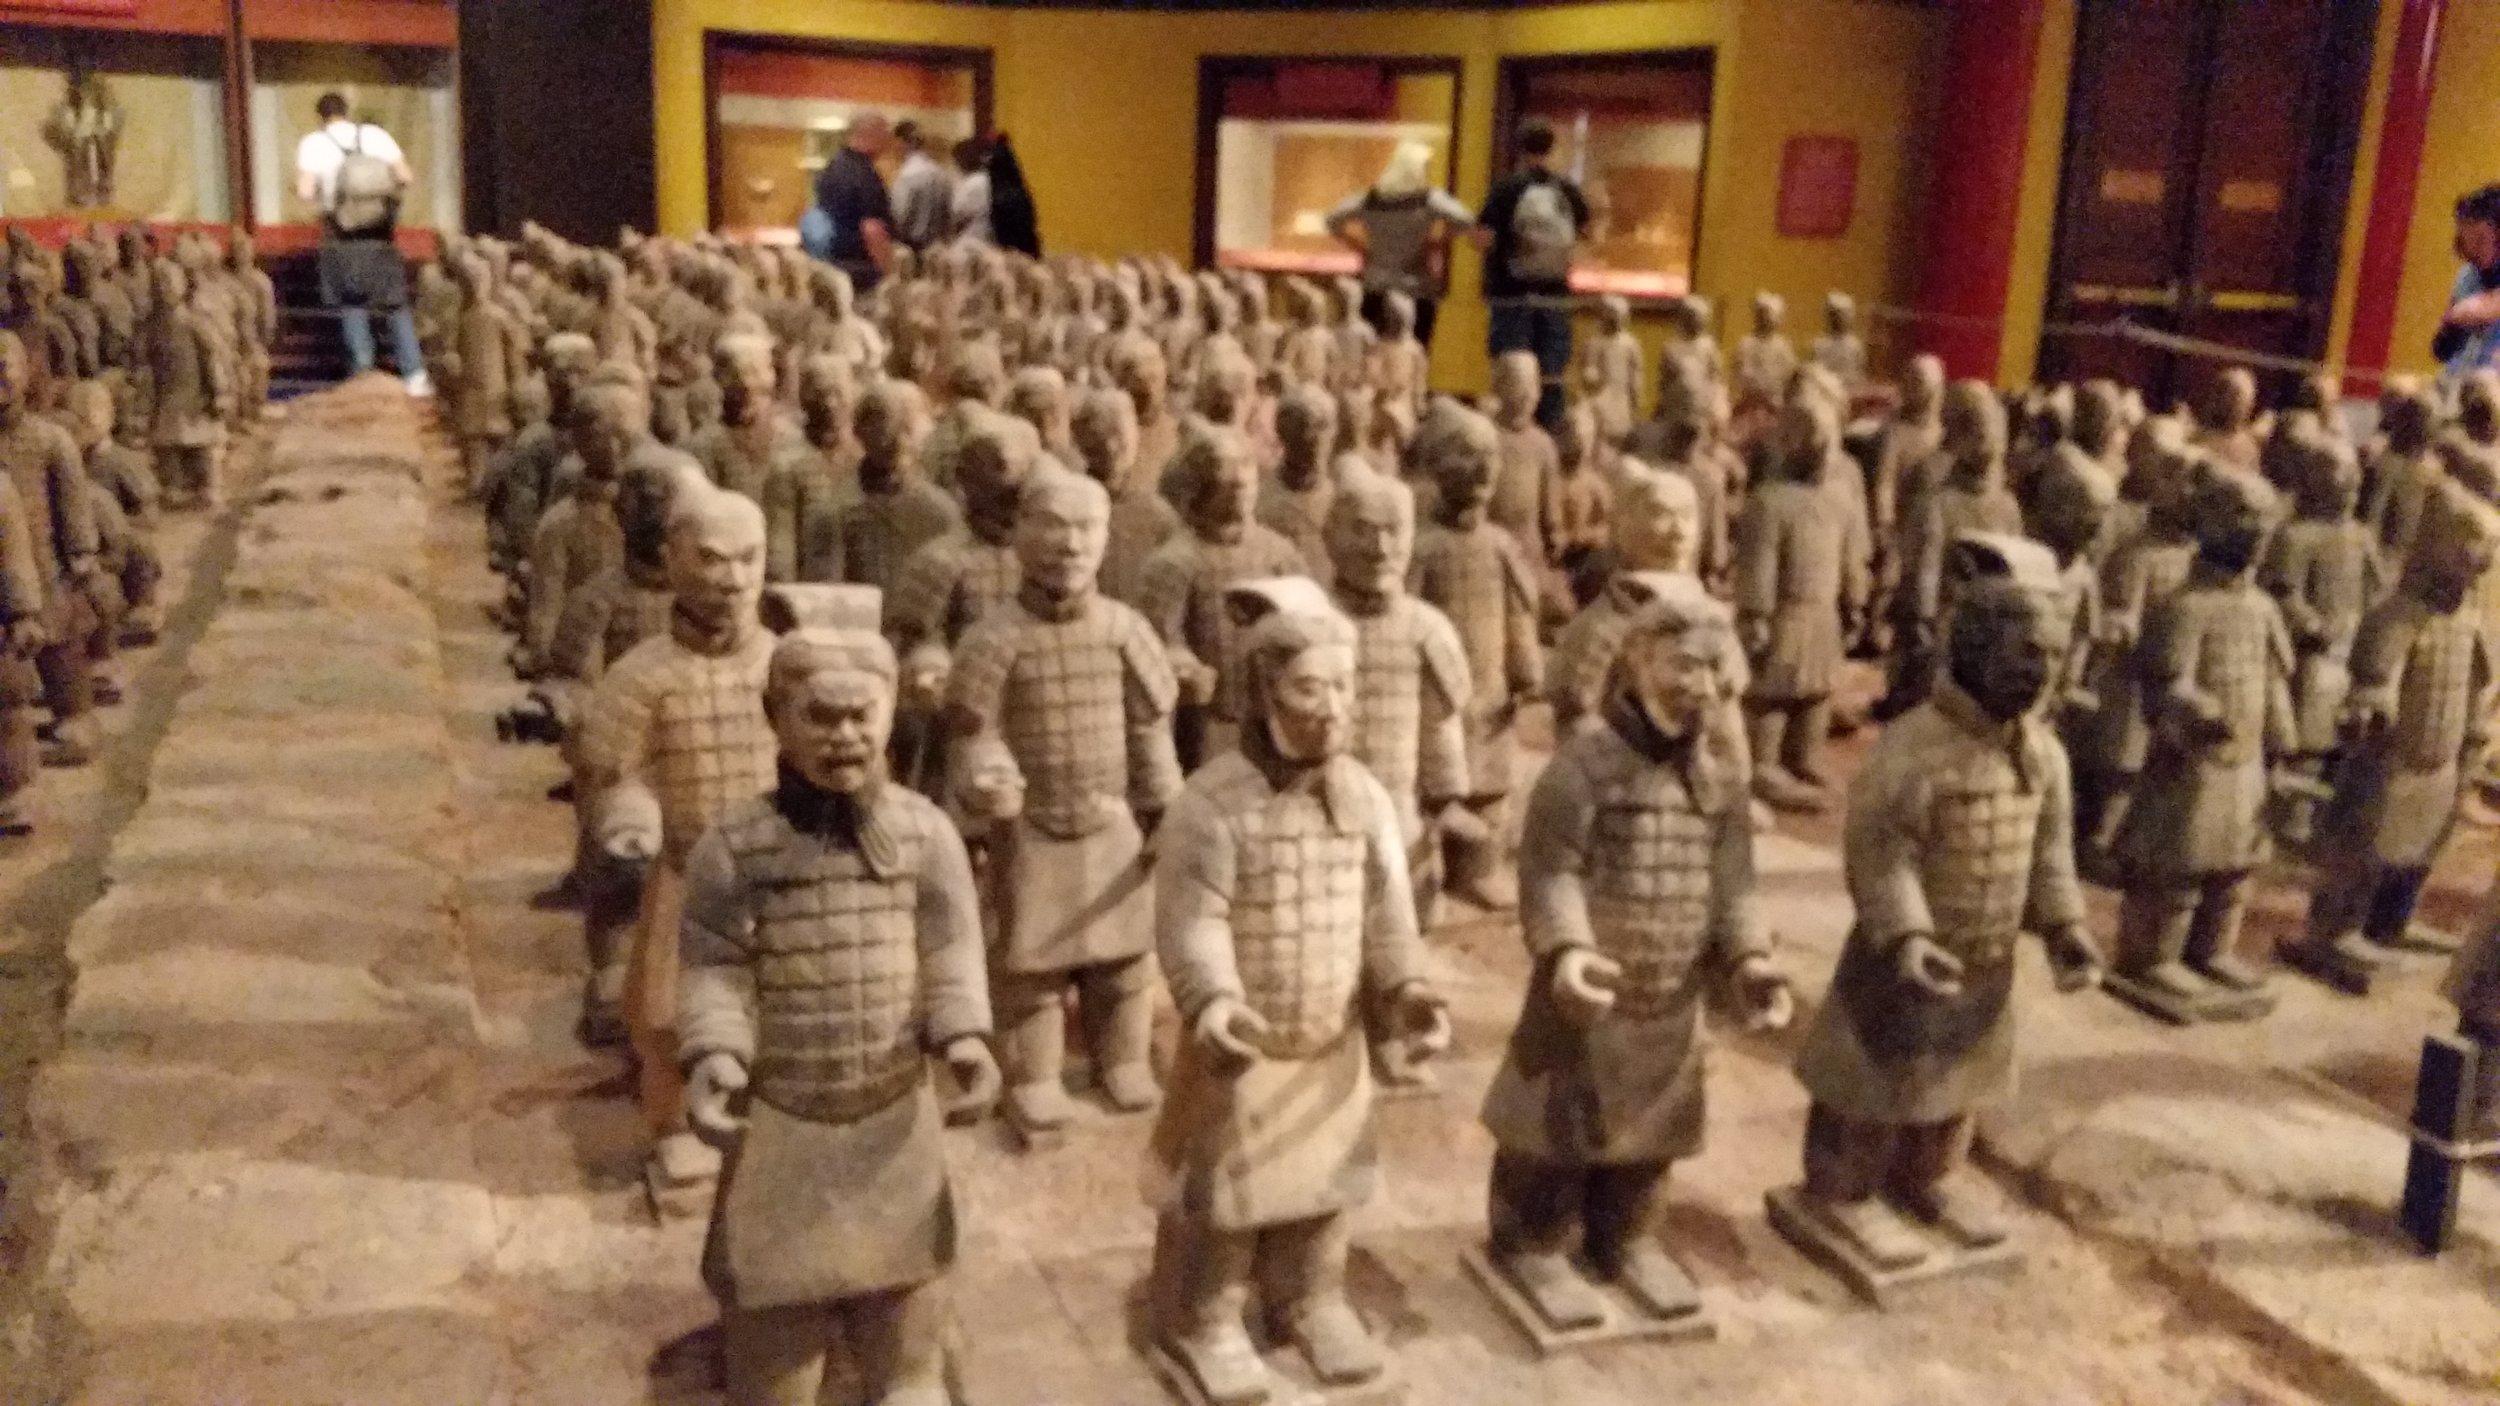 Tomb Warriors, China, World Showcase, EPCOT